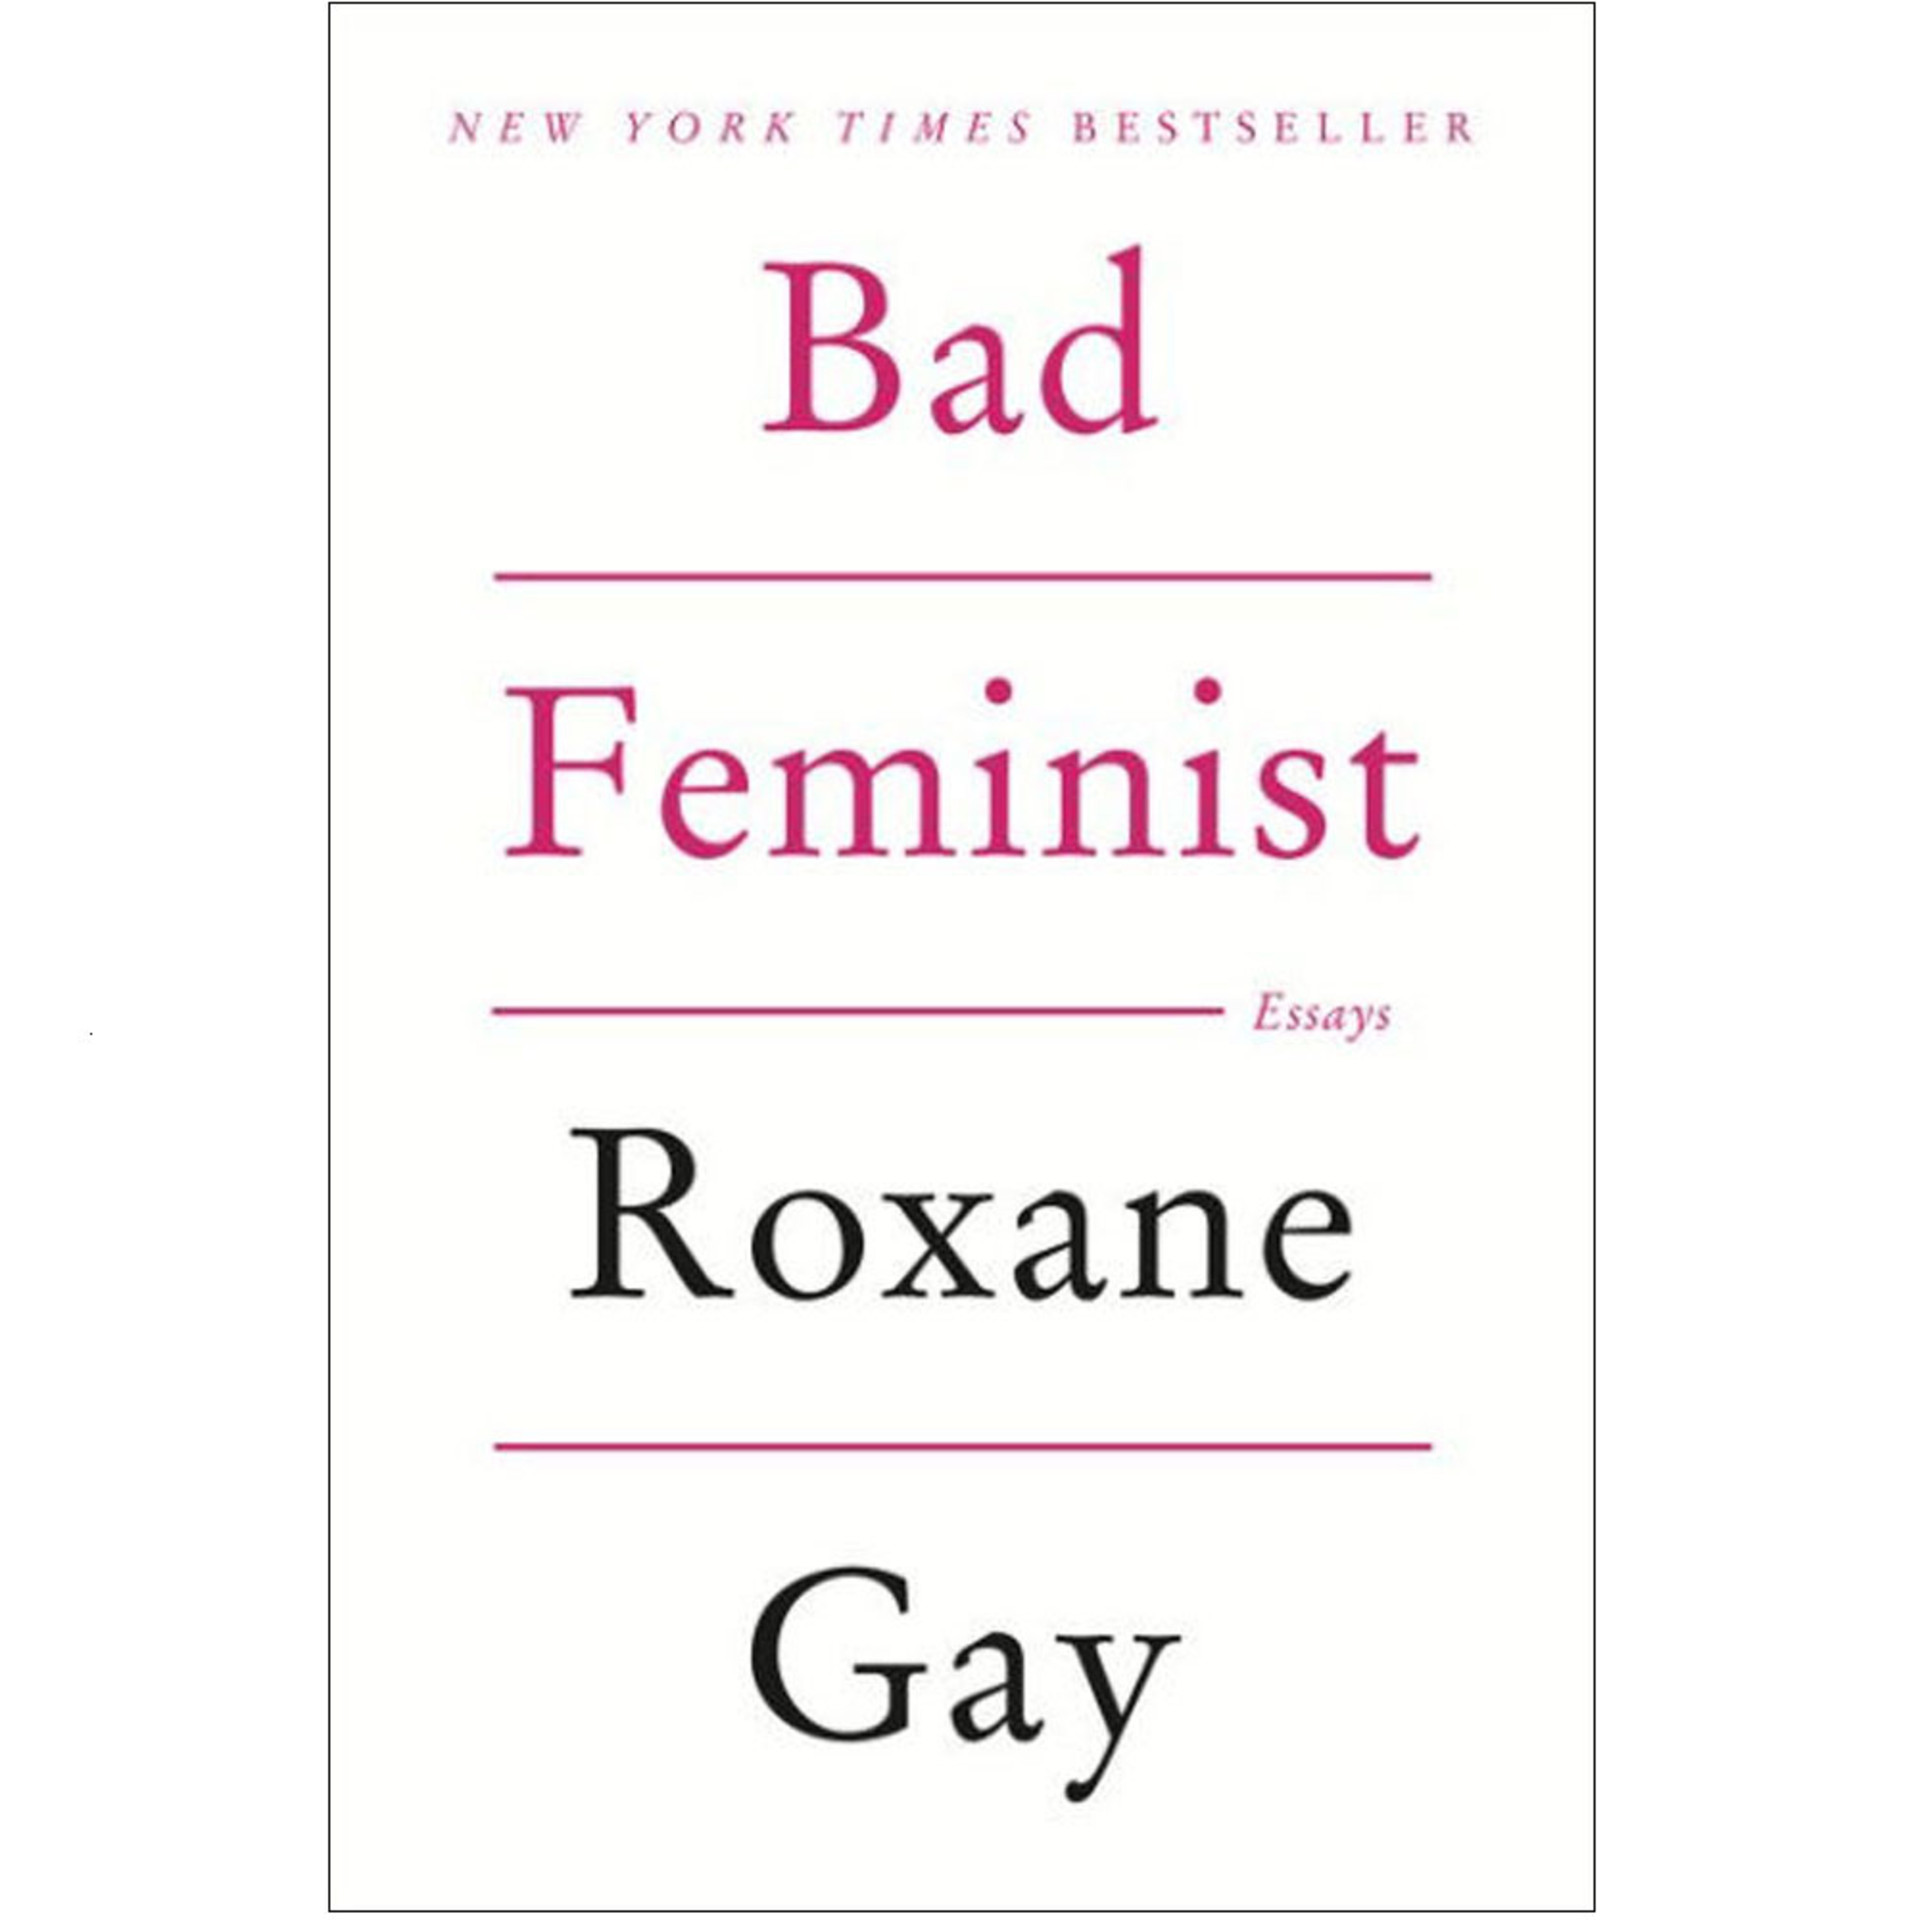 Bad Feminist: Essays by Roxane Gay